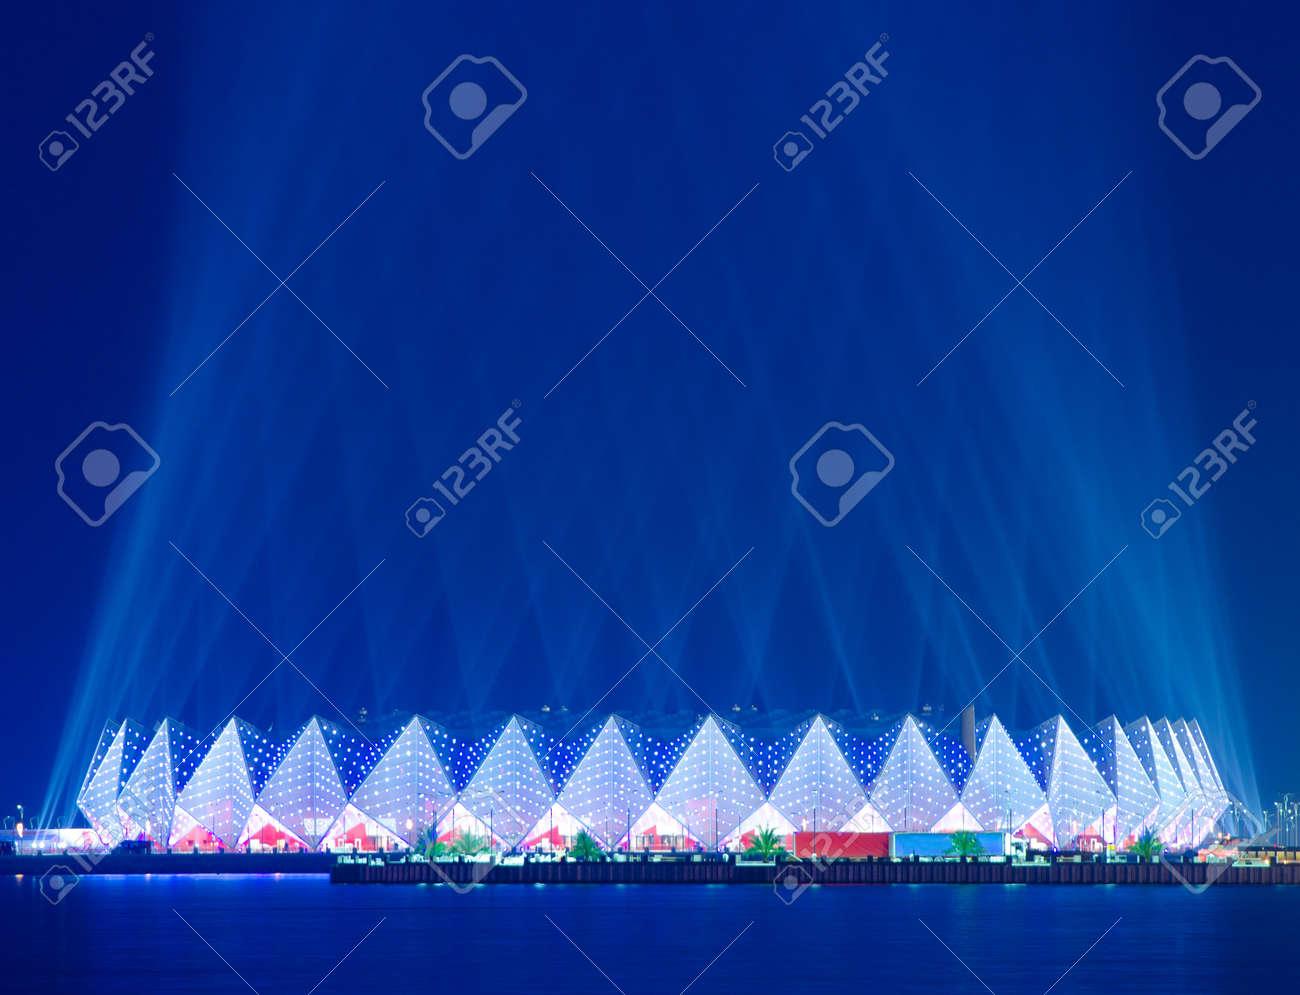 Crystal Hall - Eurovision 2012 venue Baku Azerbaijan Stock Photo - 13749458